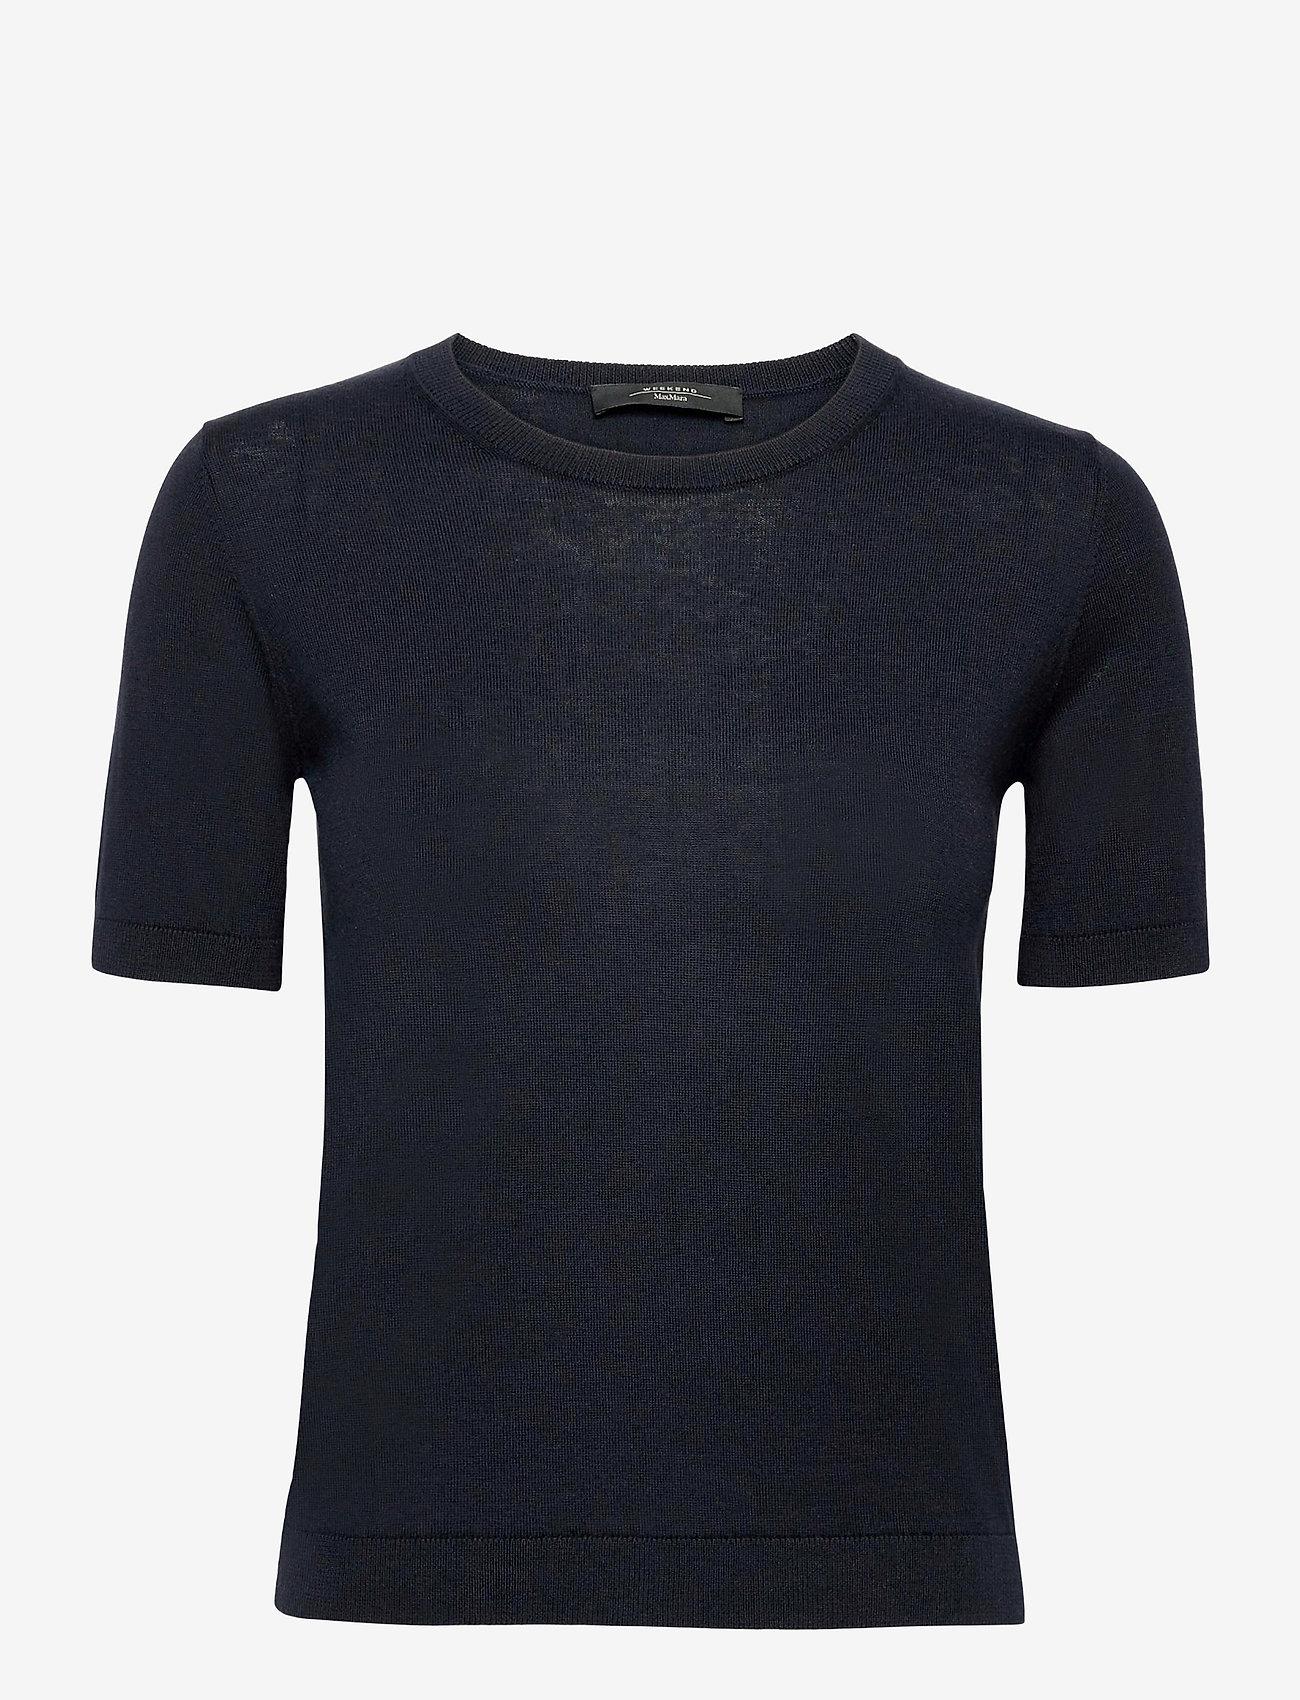 Weekend Max Mara - CAIRO - gebreide t-shirts - navy - 0